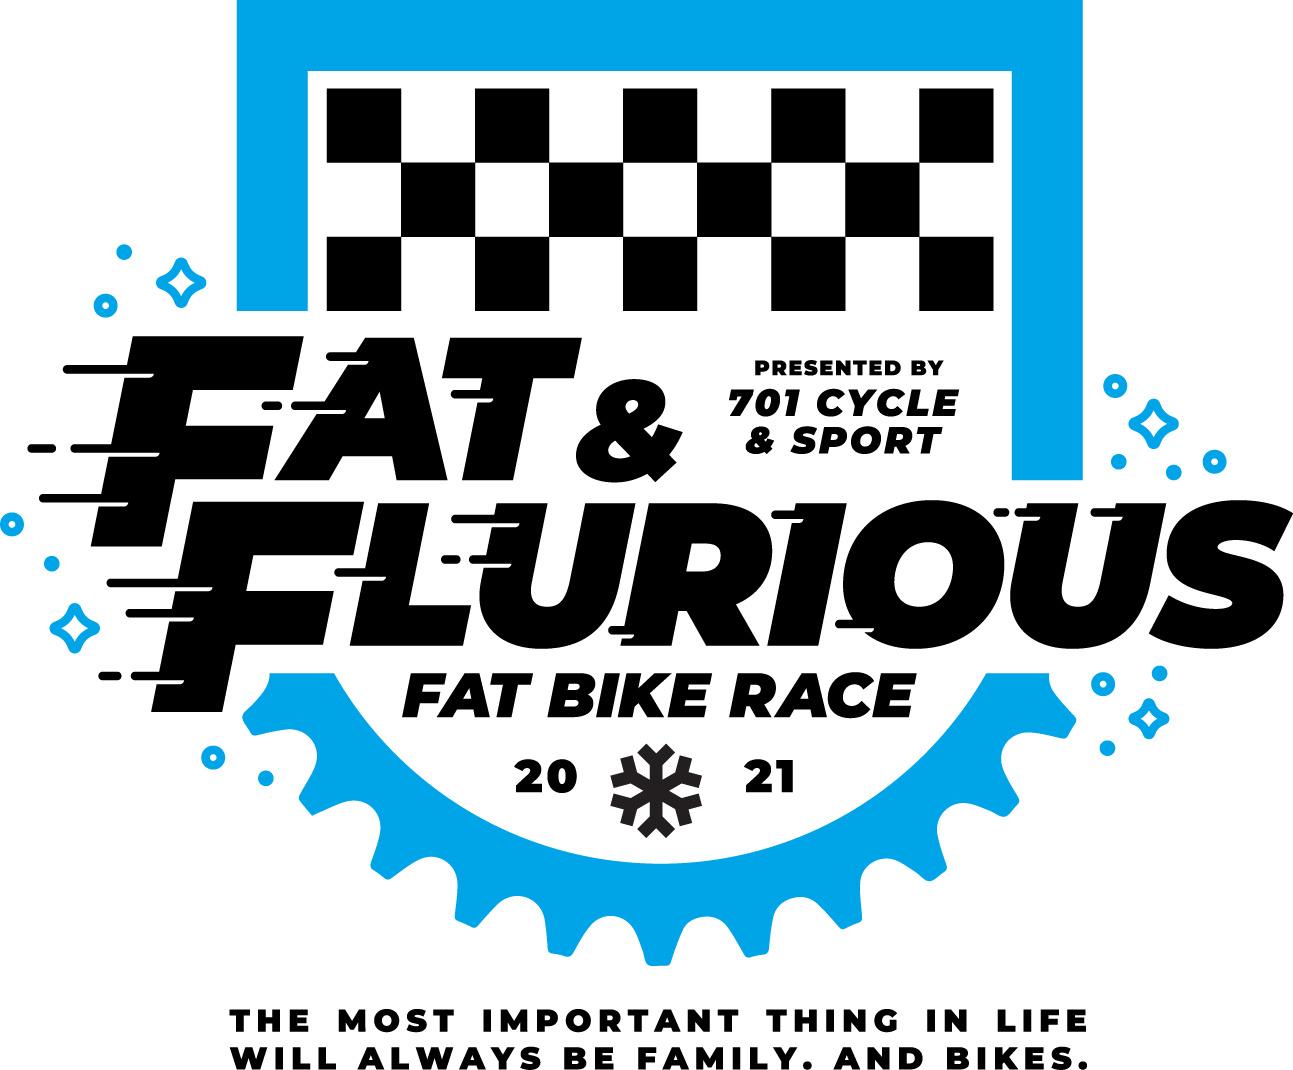 2021 Fat & Flurious Fat Bike Race Results